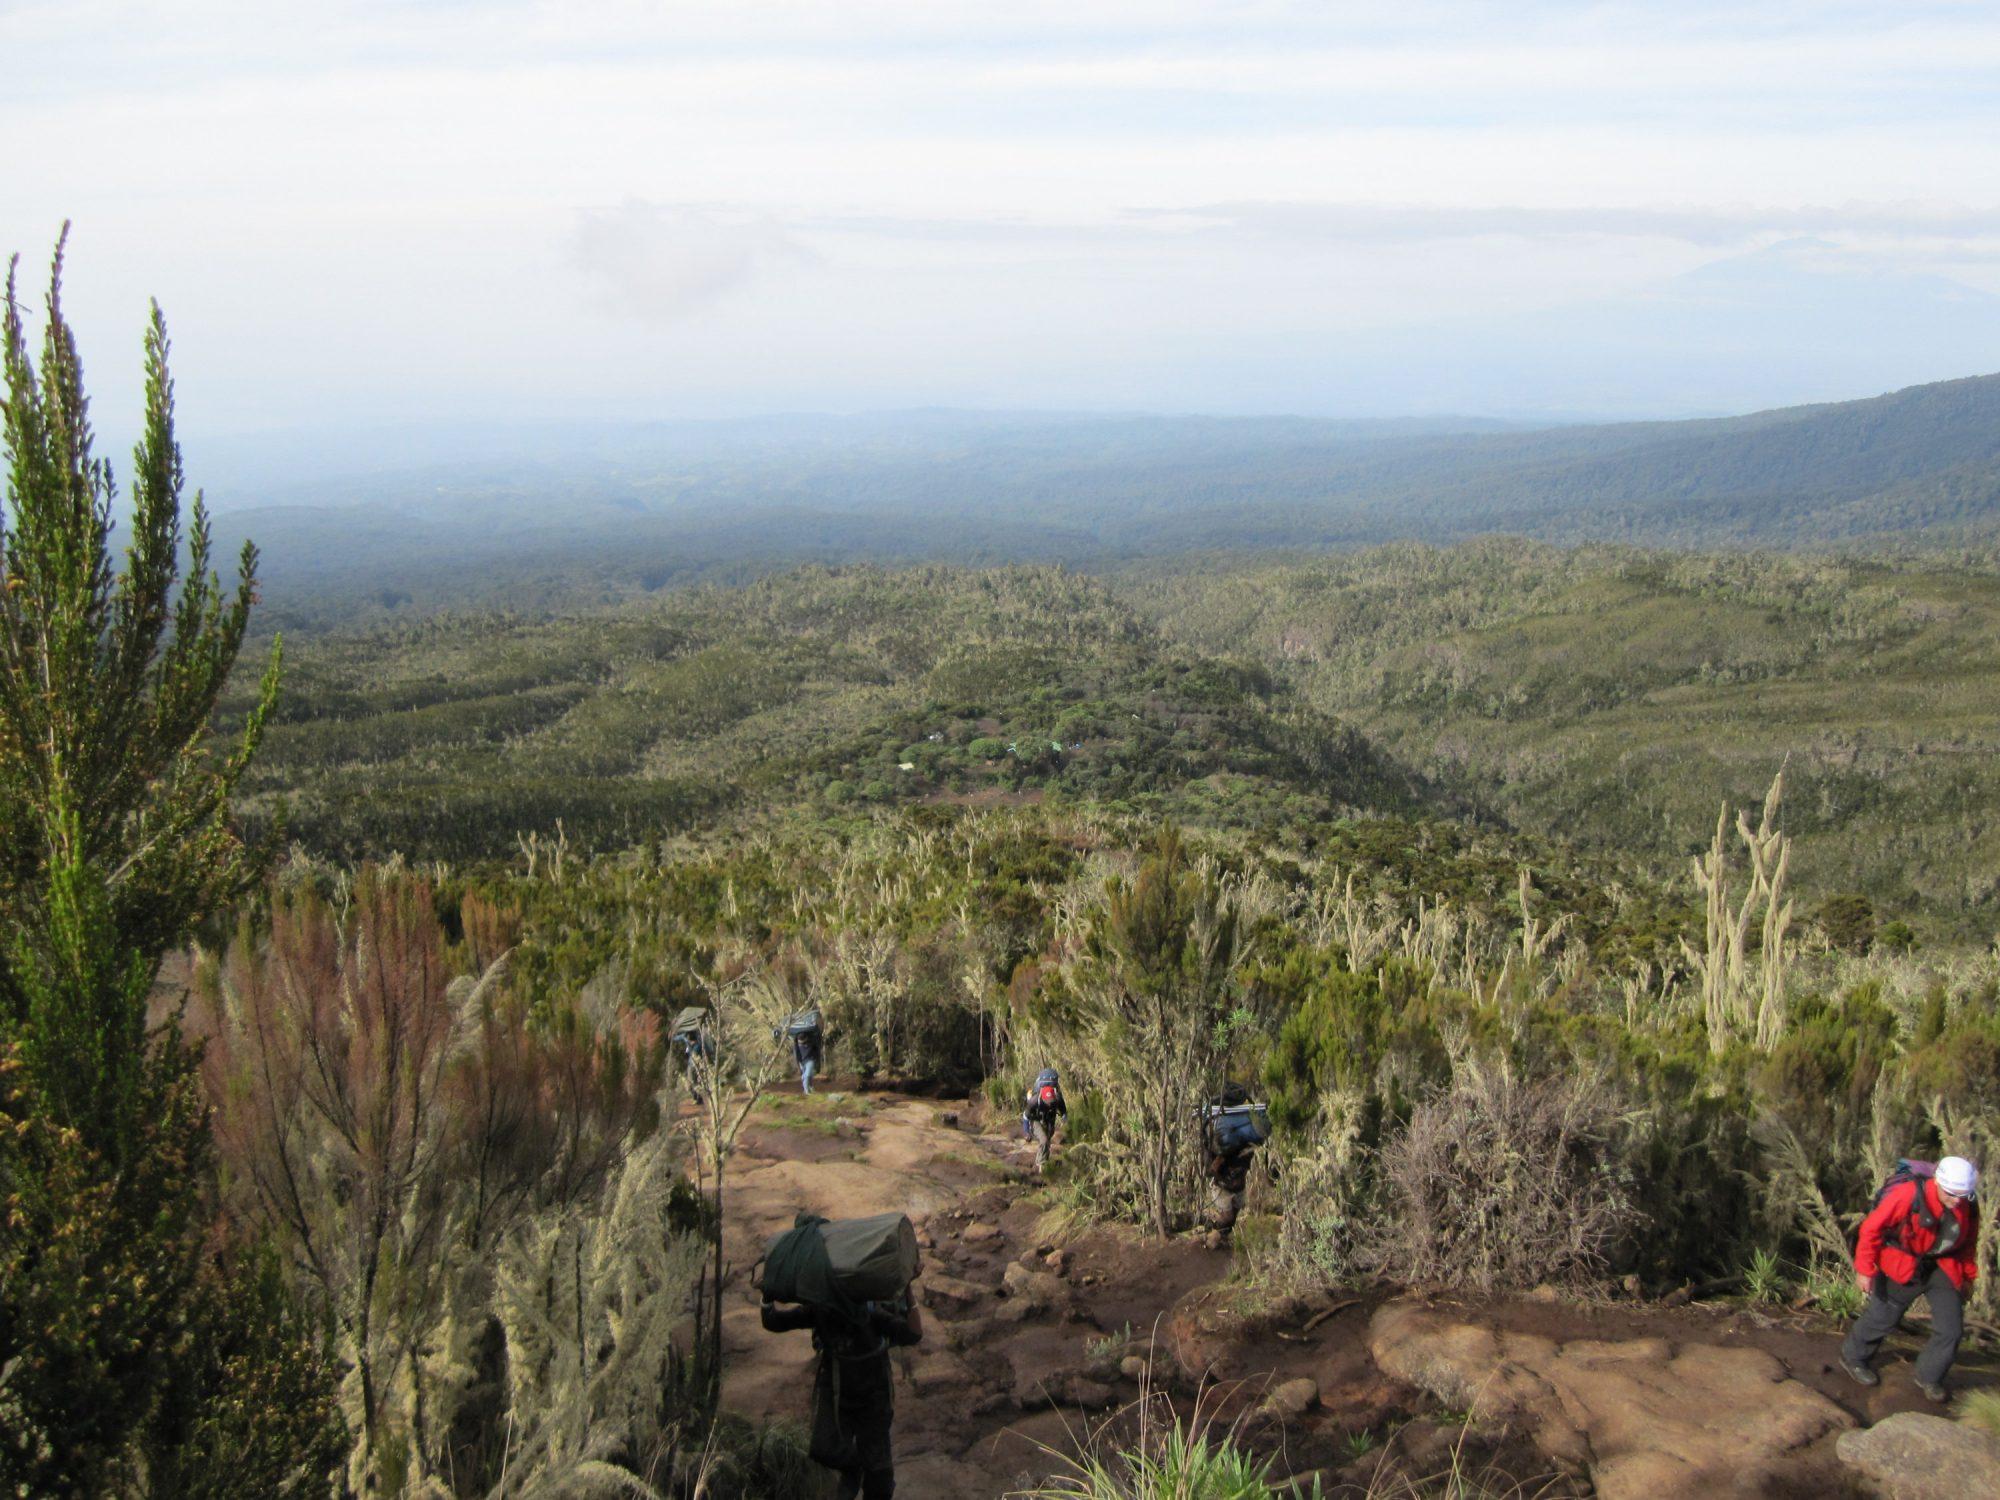 Wandern, Träger, Kilimandscharo, Kilimandscharo besteigen, Tansania, Afrika, Kilimandscharo Tour, Erfahrungsbericht, Machame Route